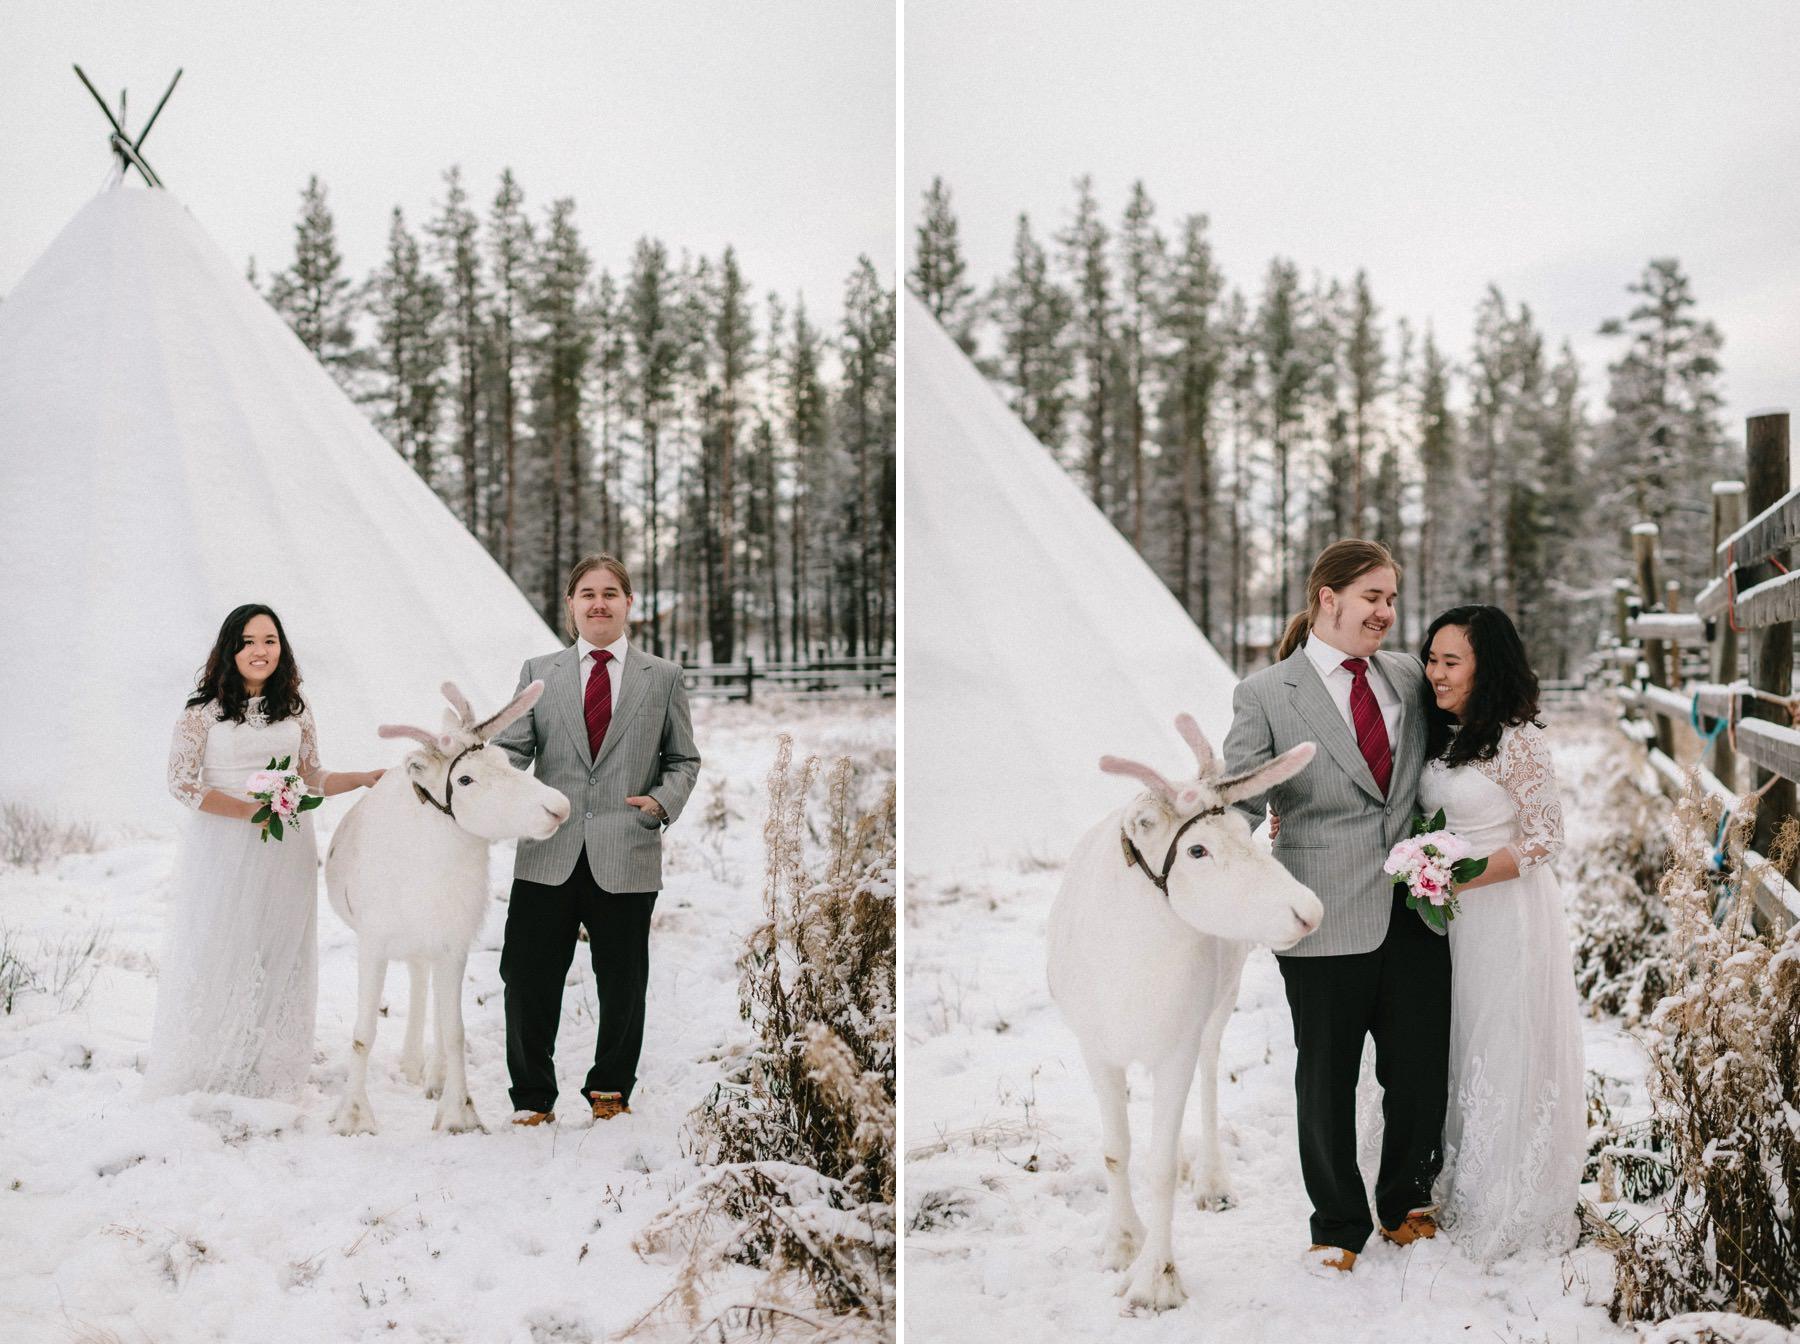 reindeer farm in Lapland prewedding